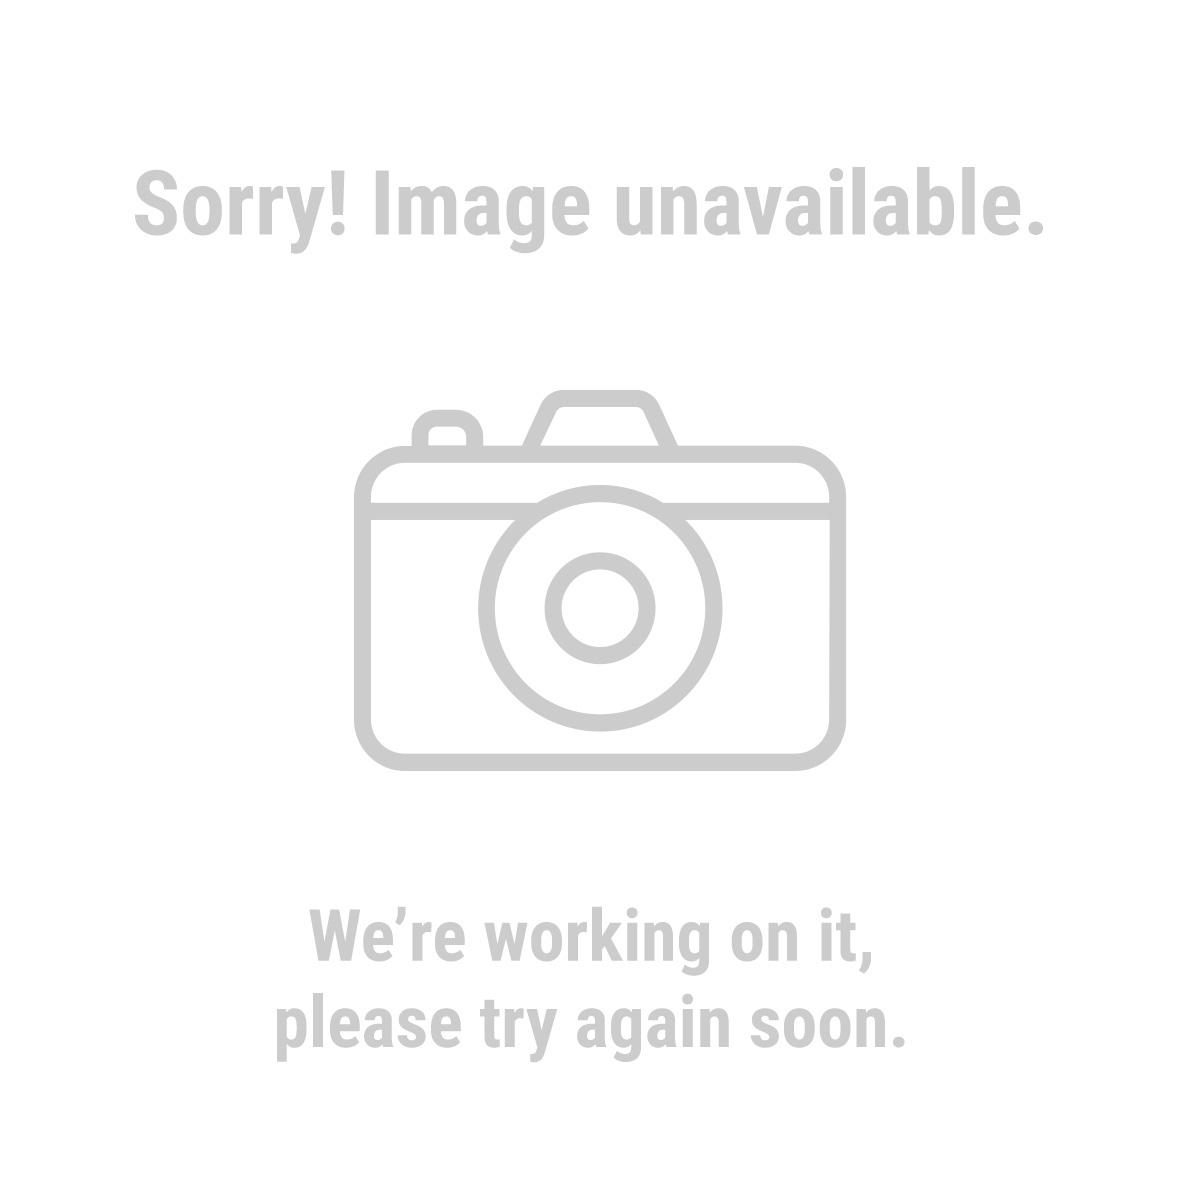 Haul-Master 61407 800 lb. Capacity Full Size Truck Rack